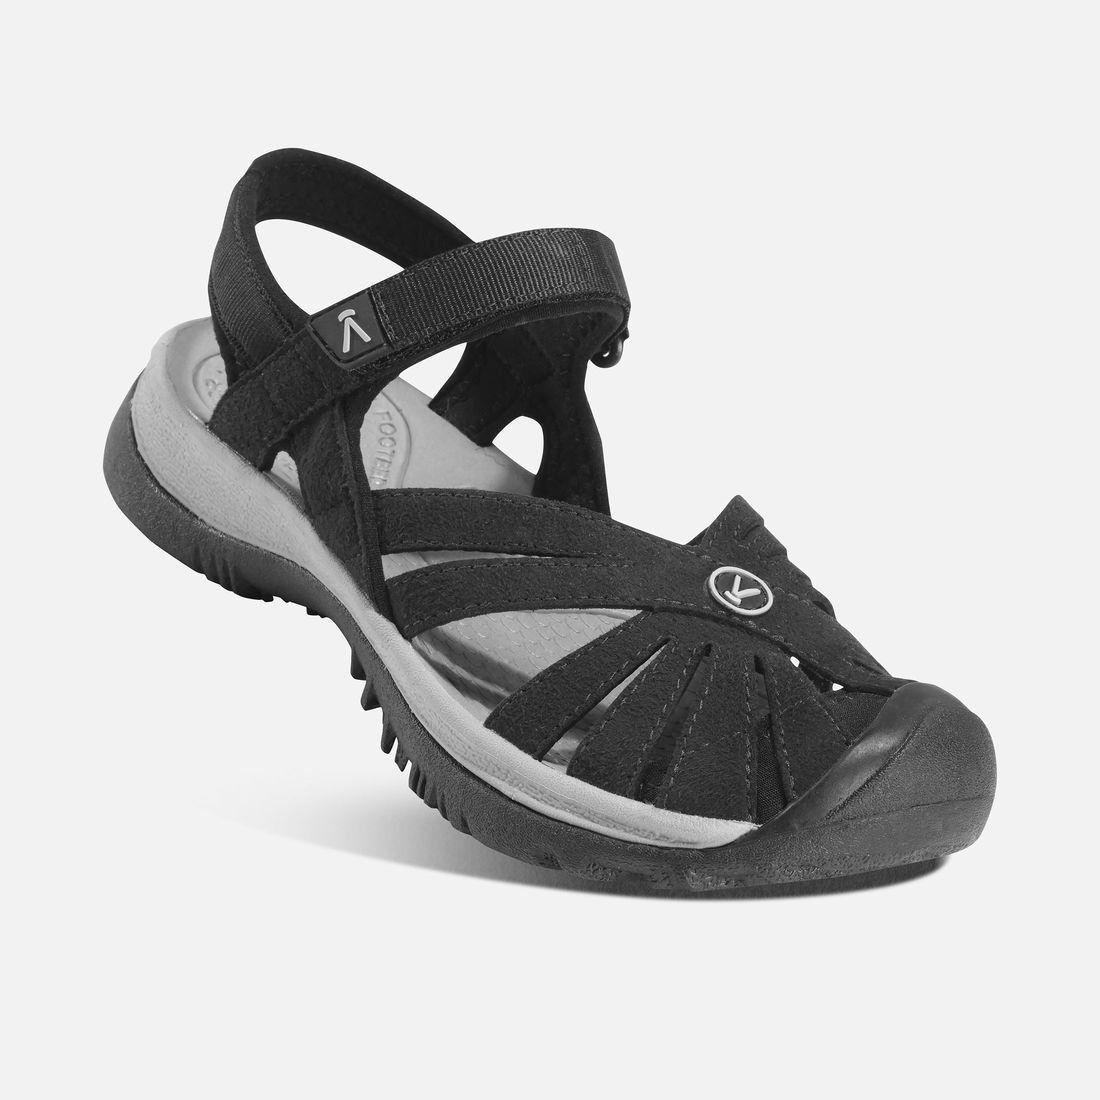 KEEN Rose Sandal W Black / Neutral Gray Dámský sandál